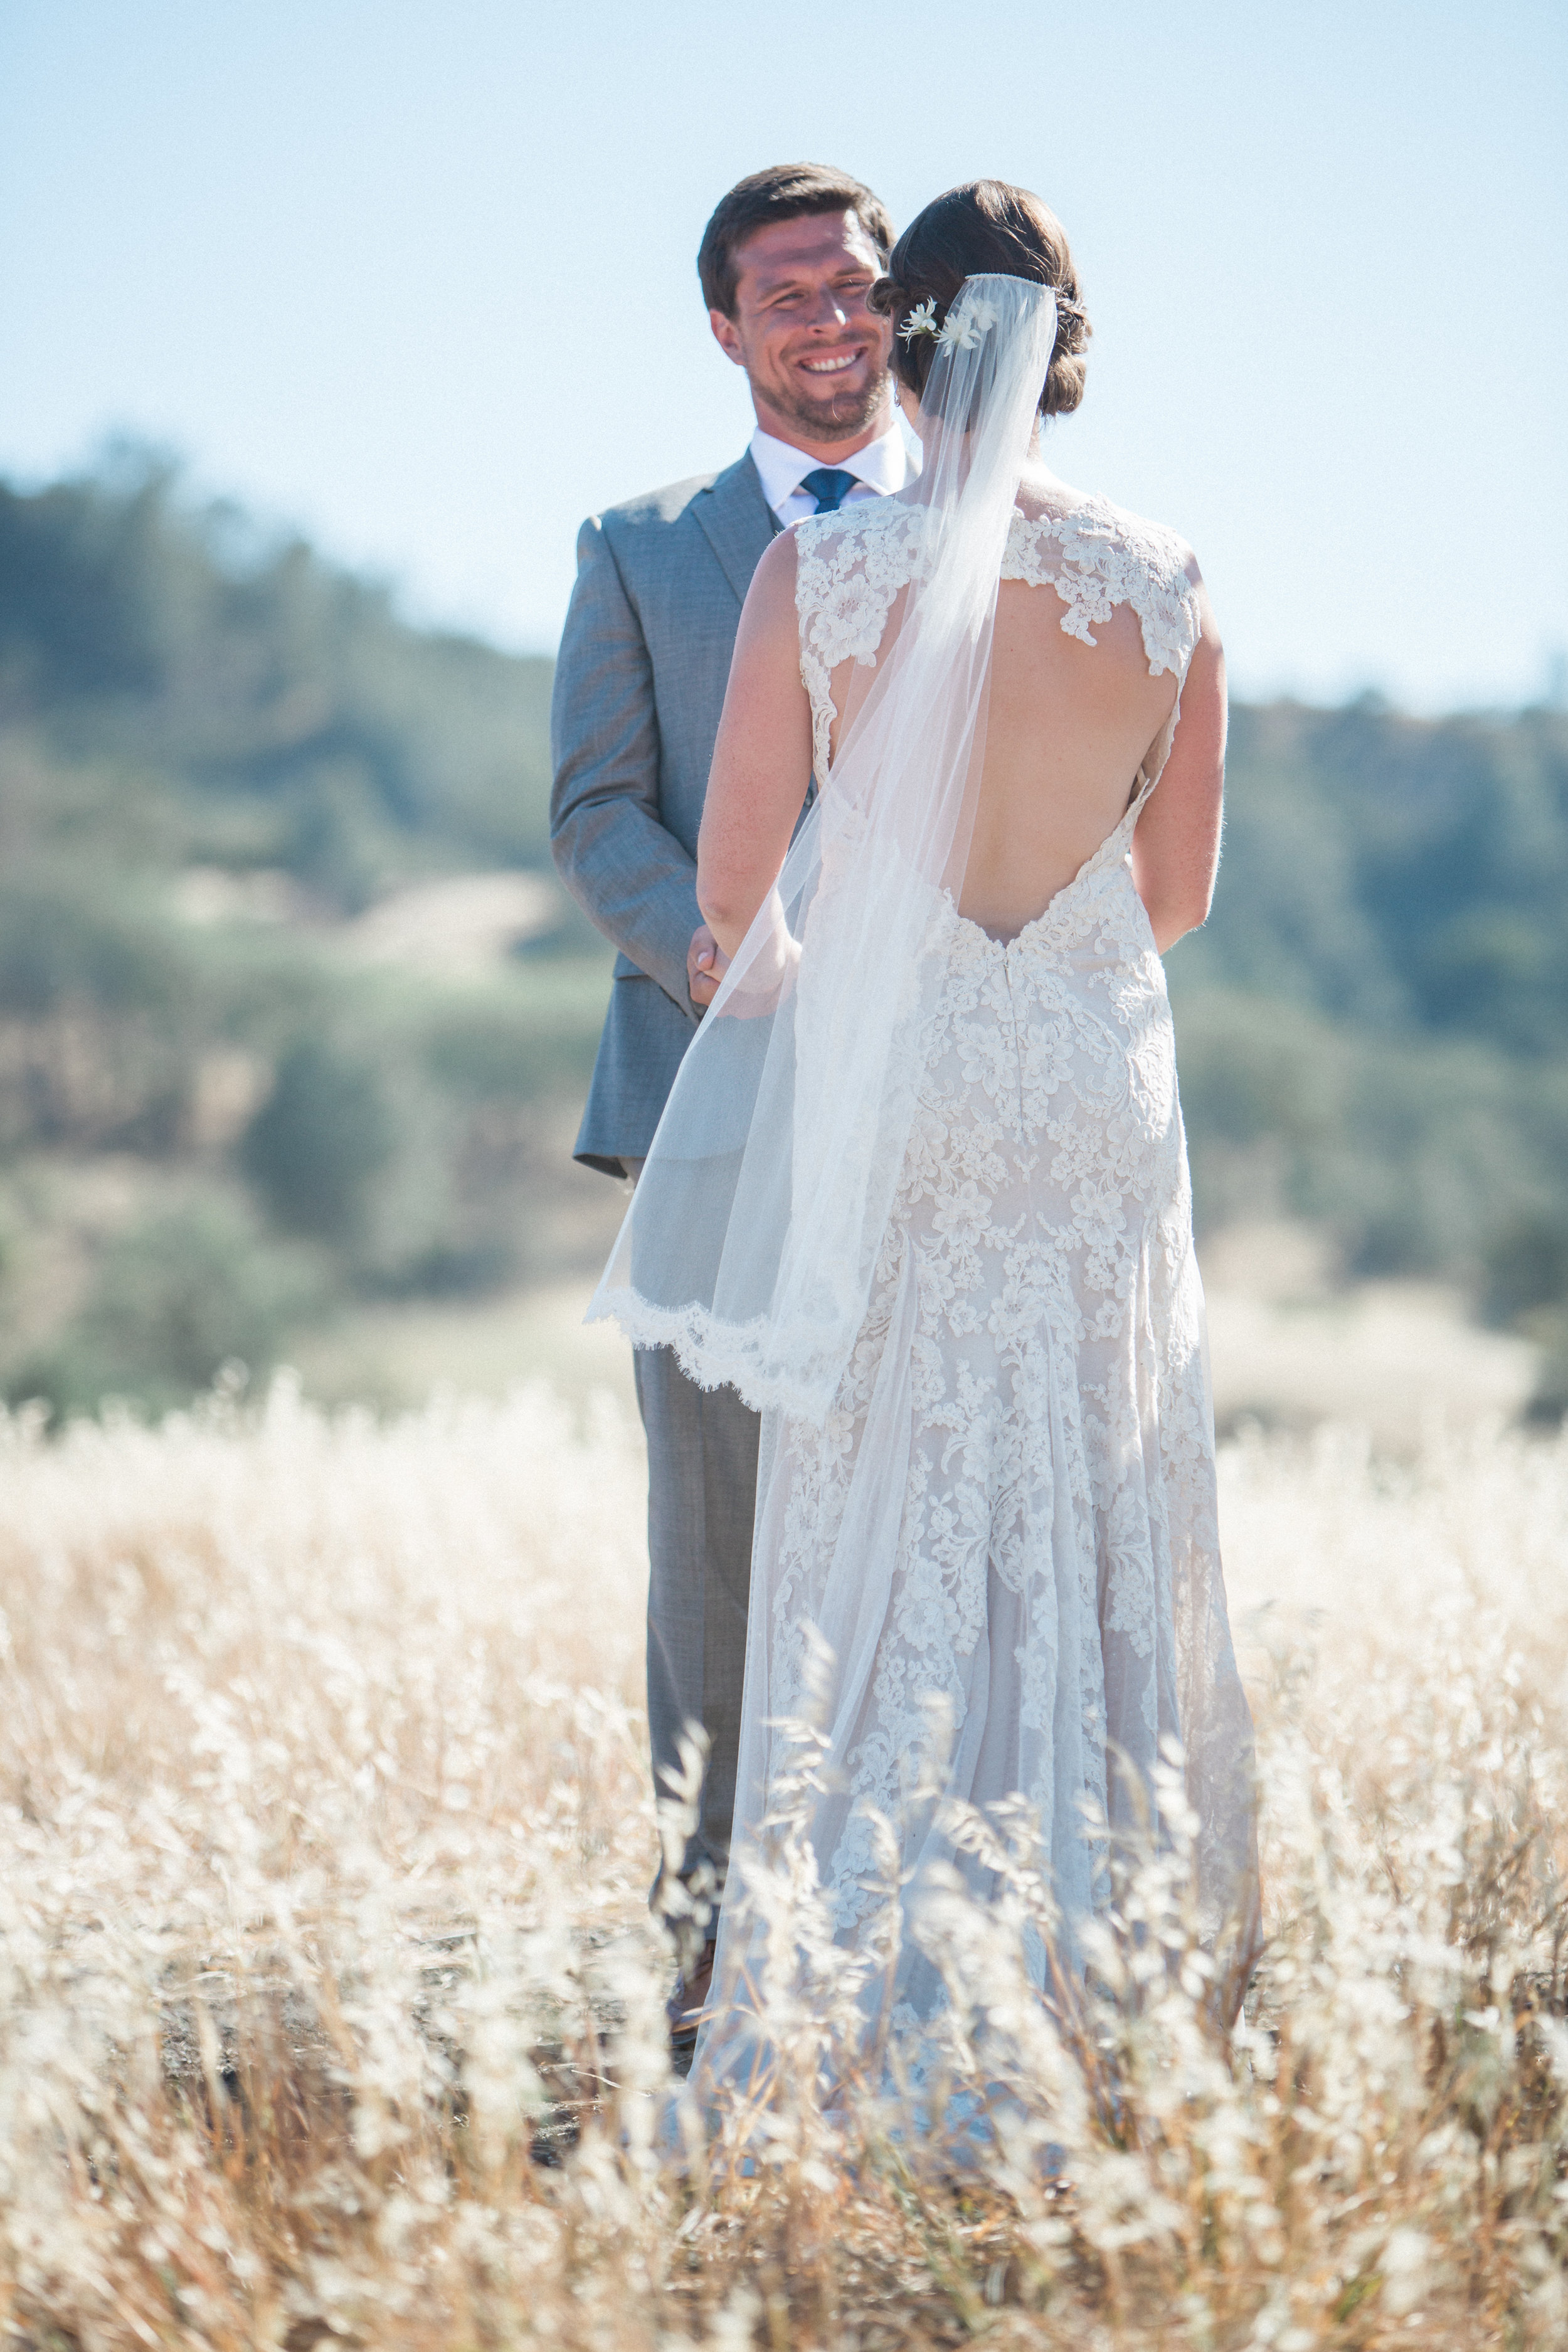 www.santabarbarawedding.com | Kiel Rucker Photography | Joelle Charming Wedding Planner | Figueroa Mountain Farmhouse | Al Fresco Ceremony